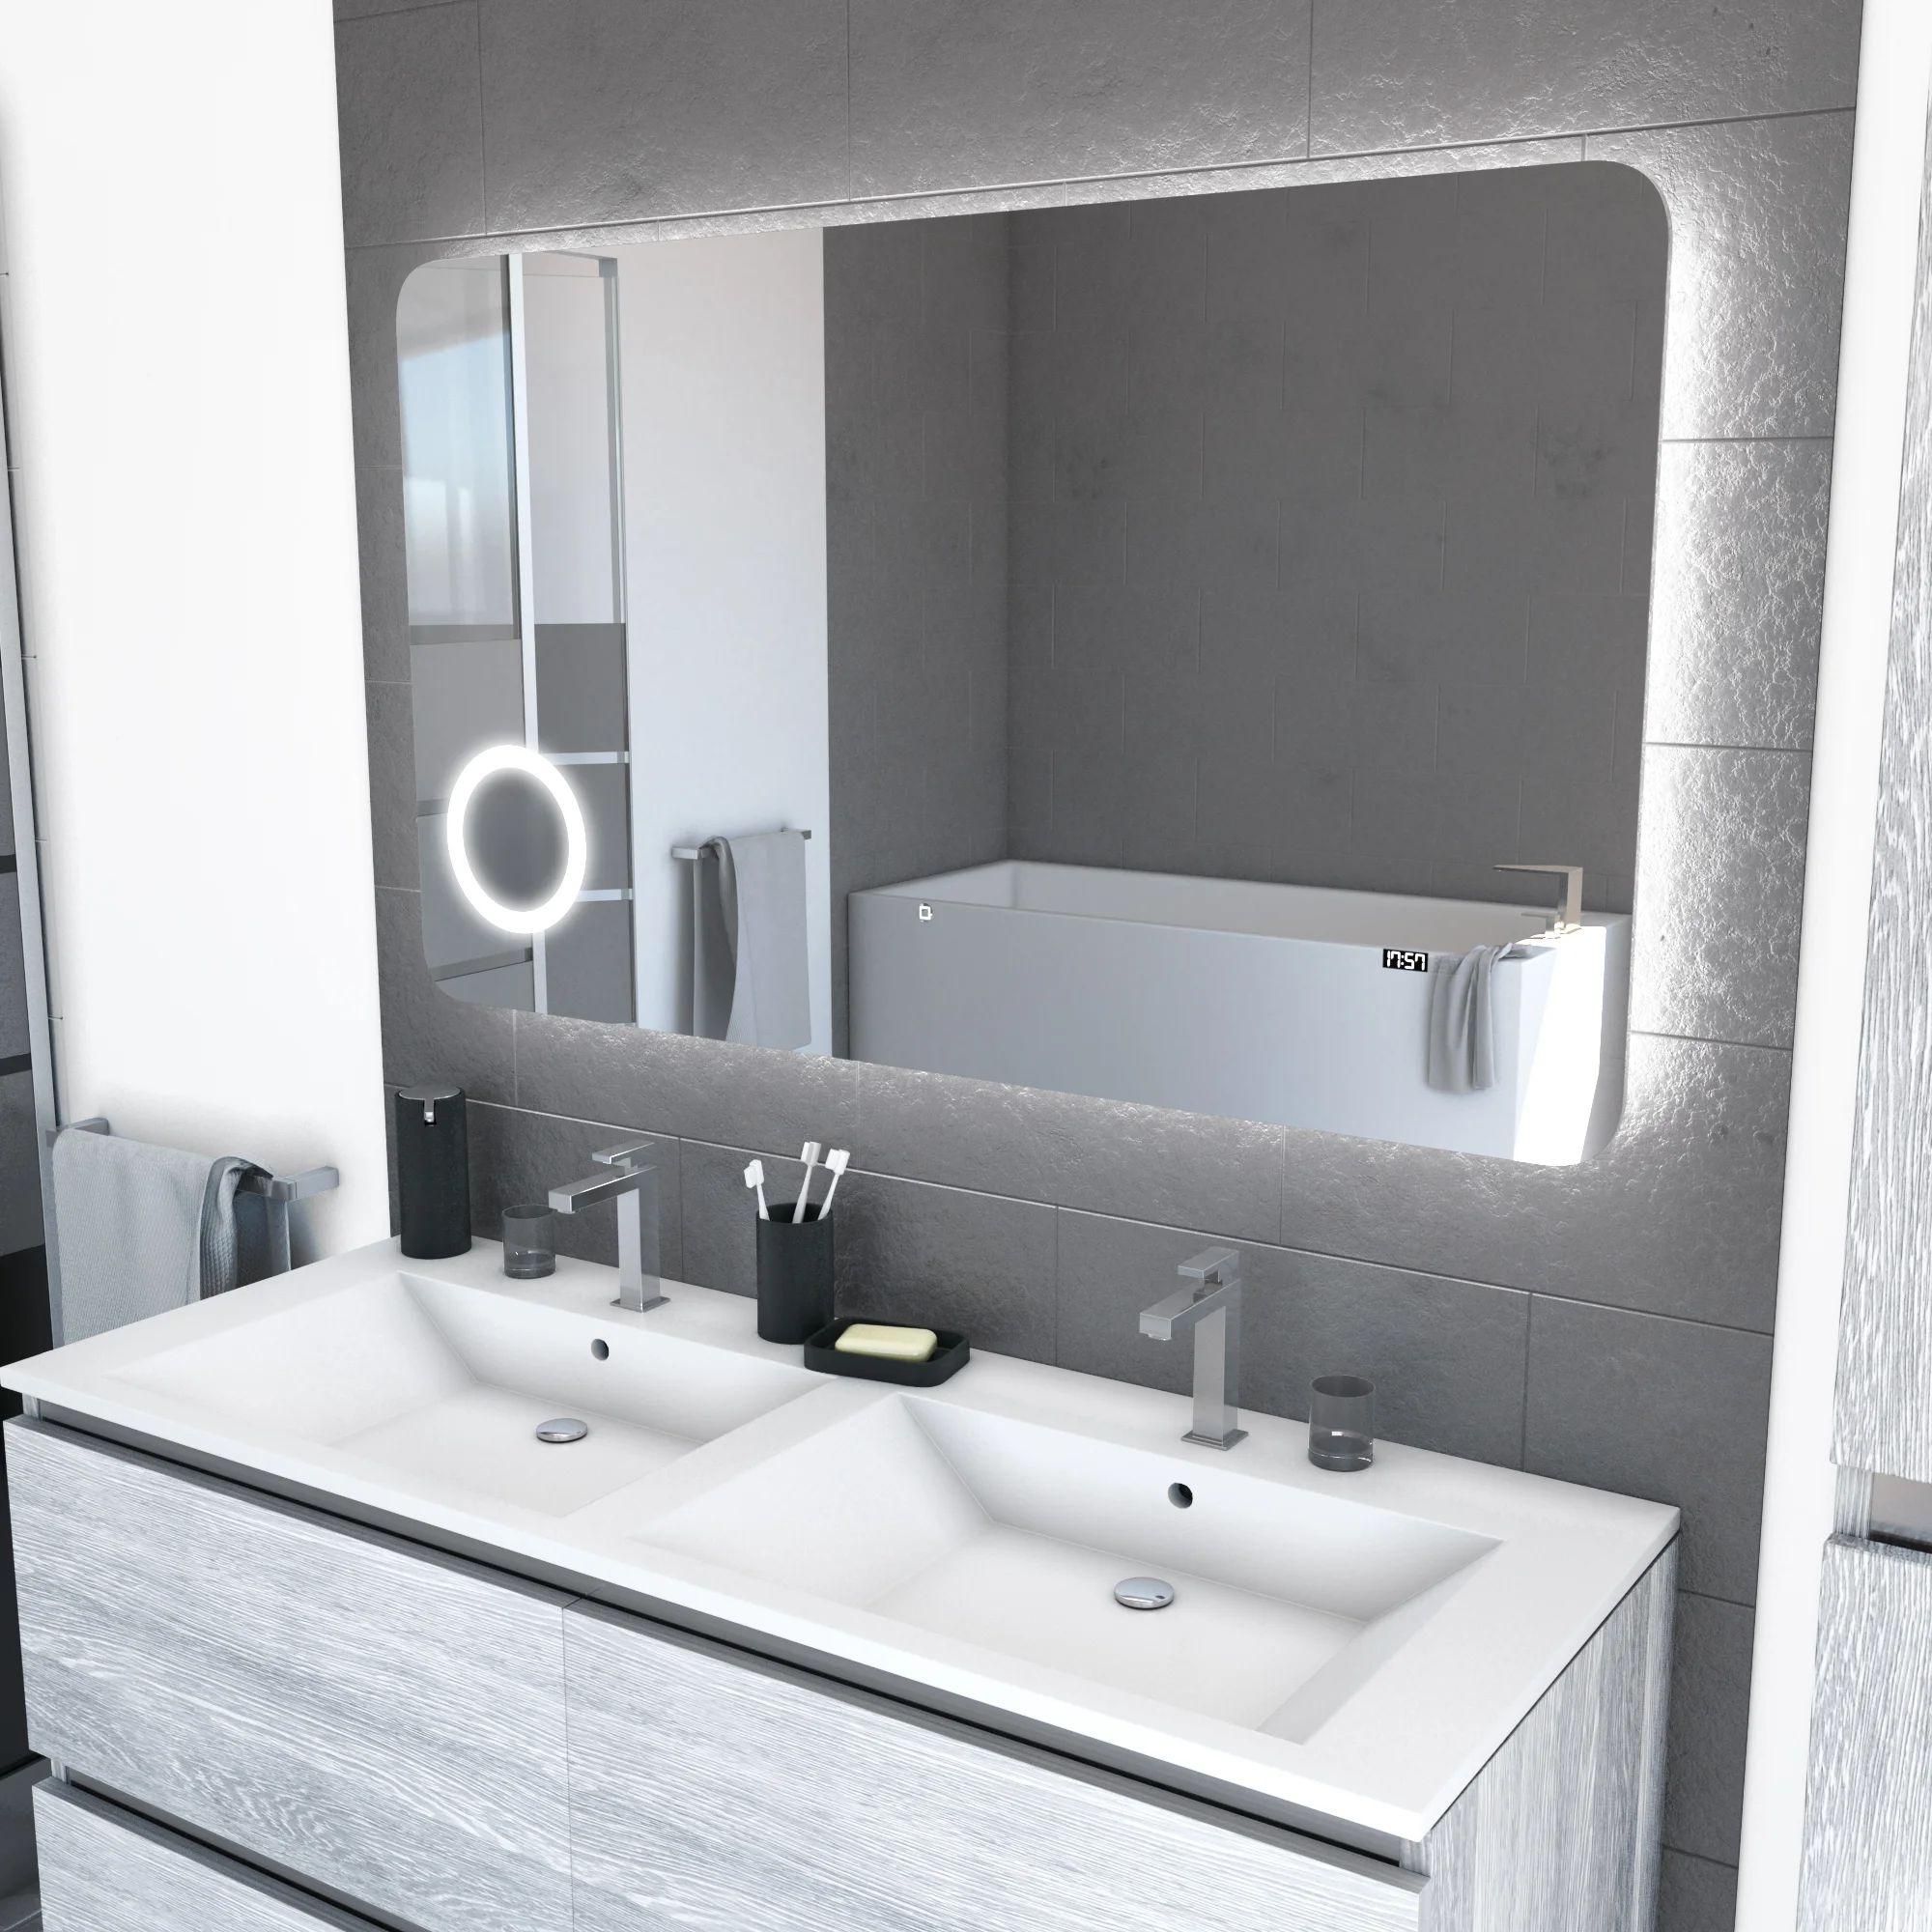 Miroir Lumineux Avec Eclairage Integre L 120 X H 70 Cm Silver Shadow Leroy Merlin